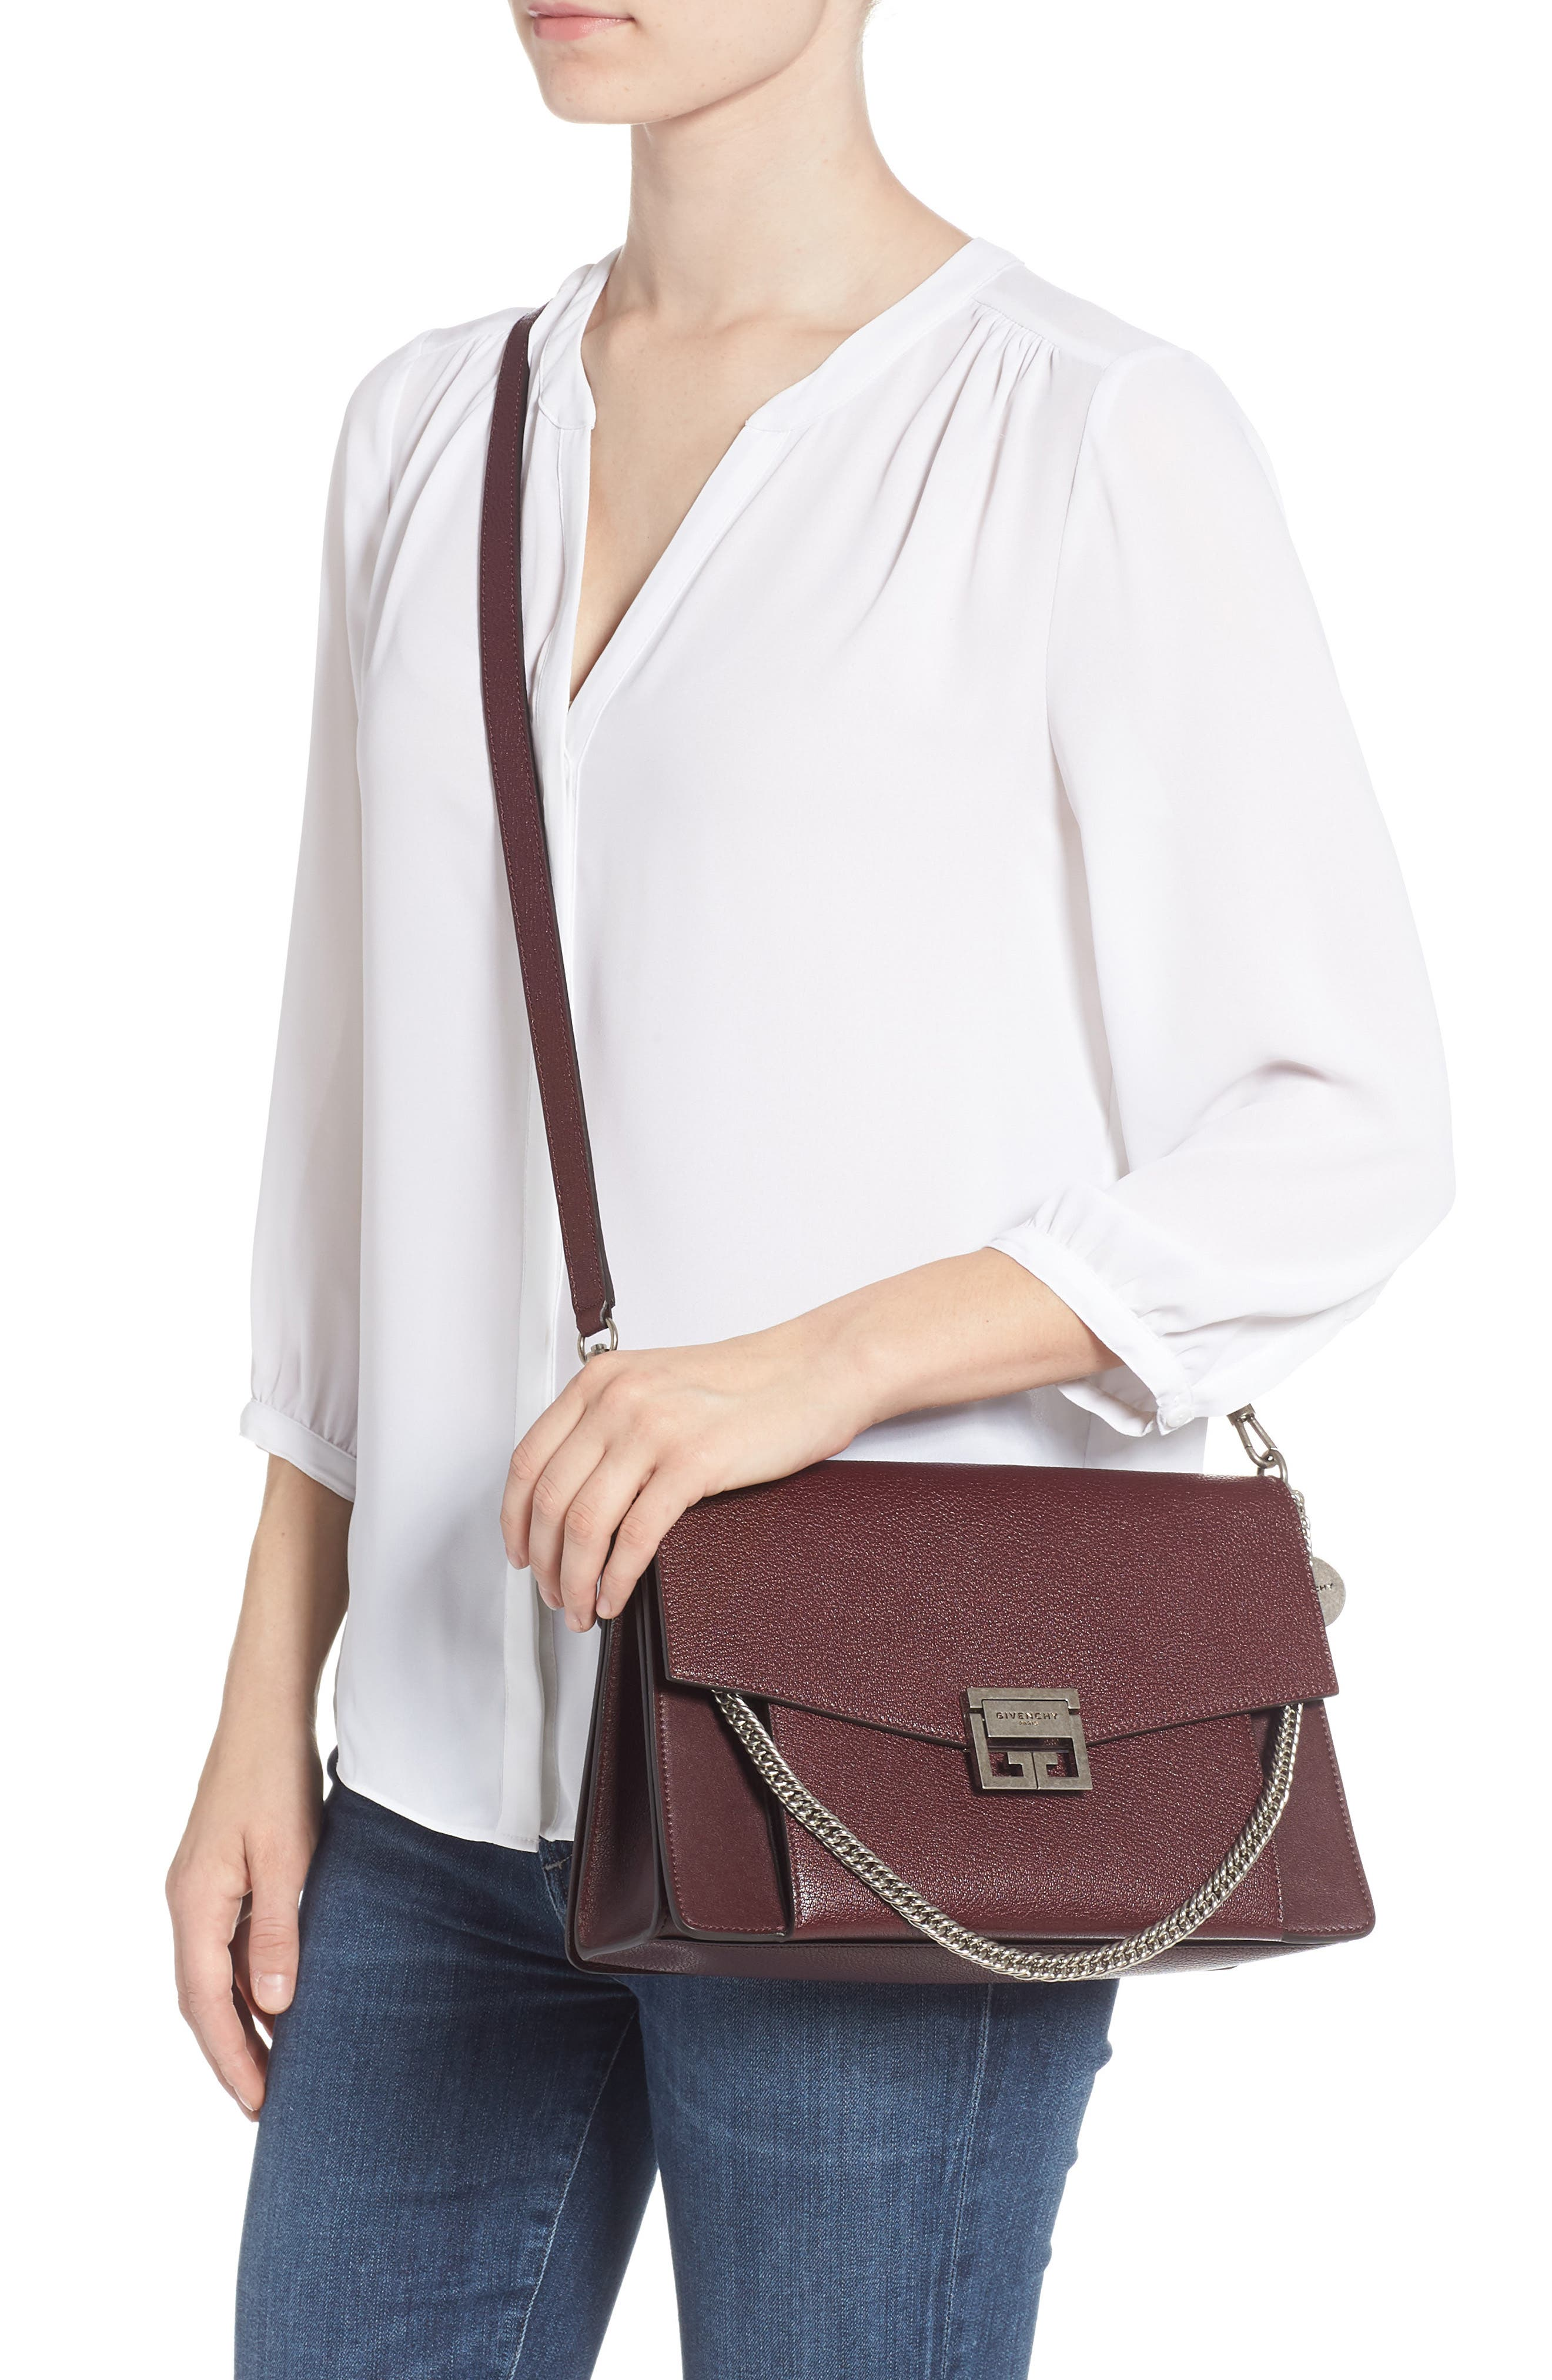 GV3 Goatskin Leather Shoulder Bag,                             Alternate thumbnail 2, color,                             Aubergine